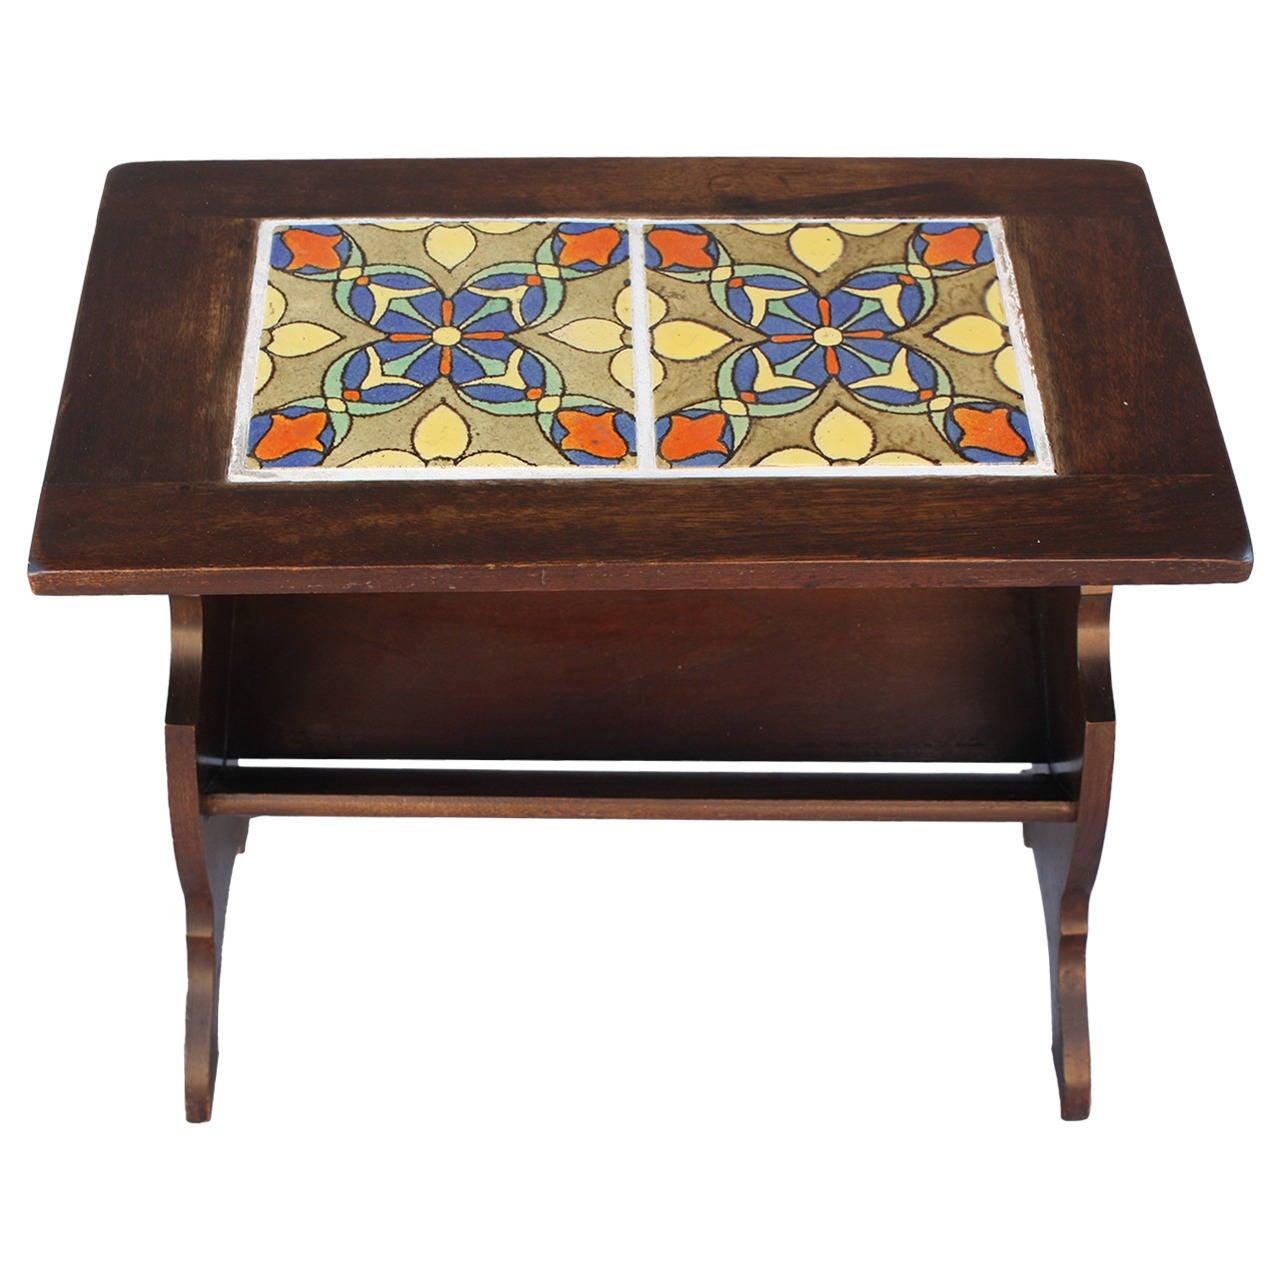 Good Antique California Tile Malibu Magazine Stand Or Side Table 1